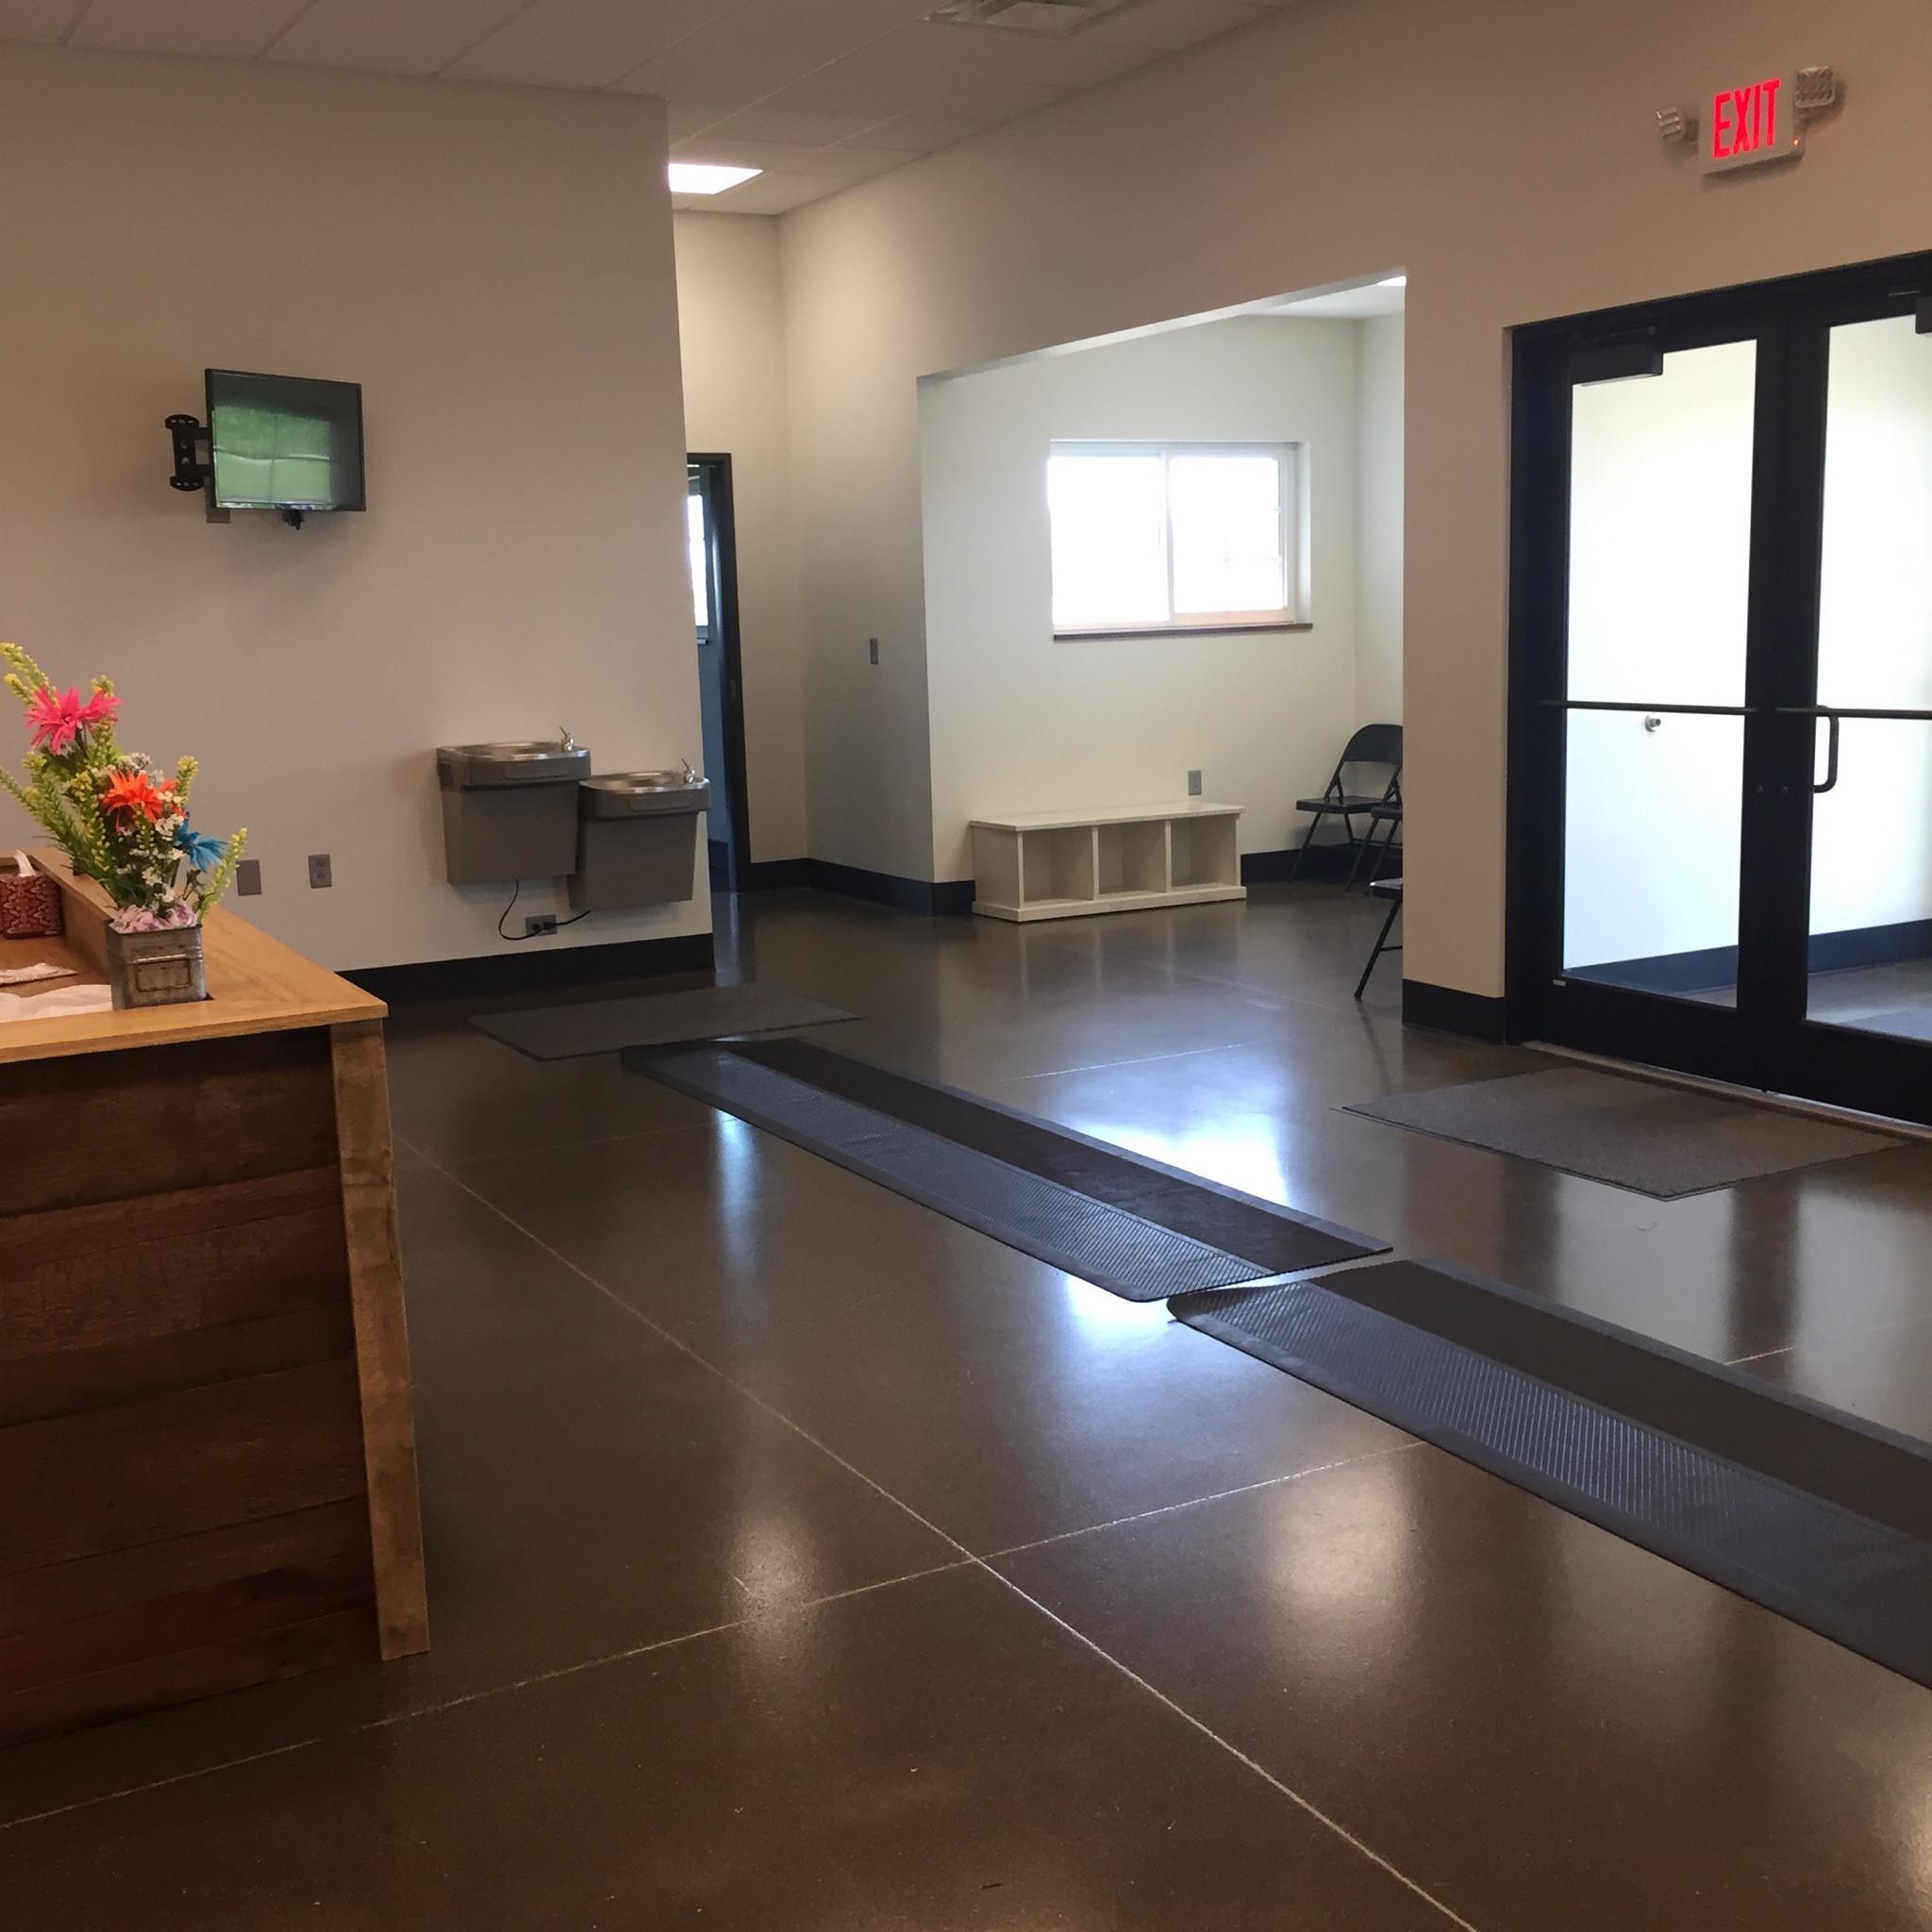 marley kezcreative flooring tile tiles luxury lovely com floor of design and asbestos